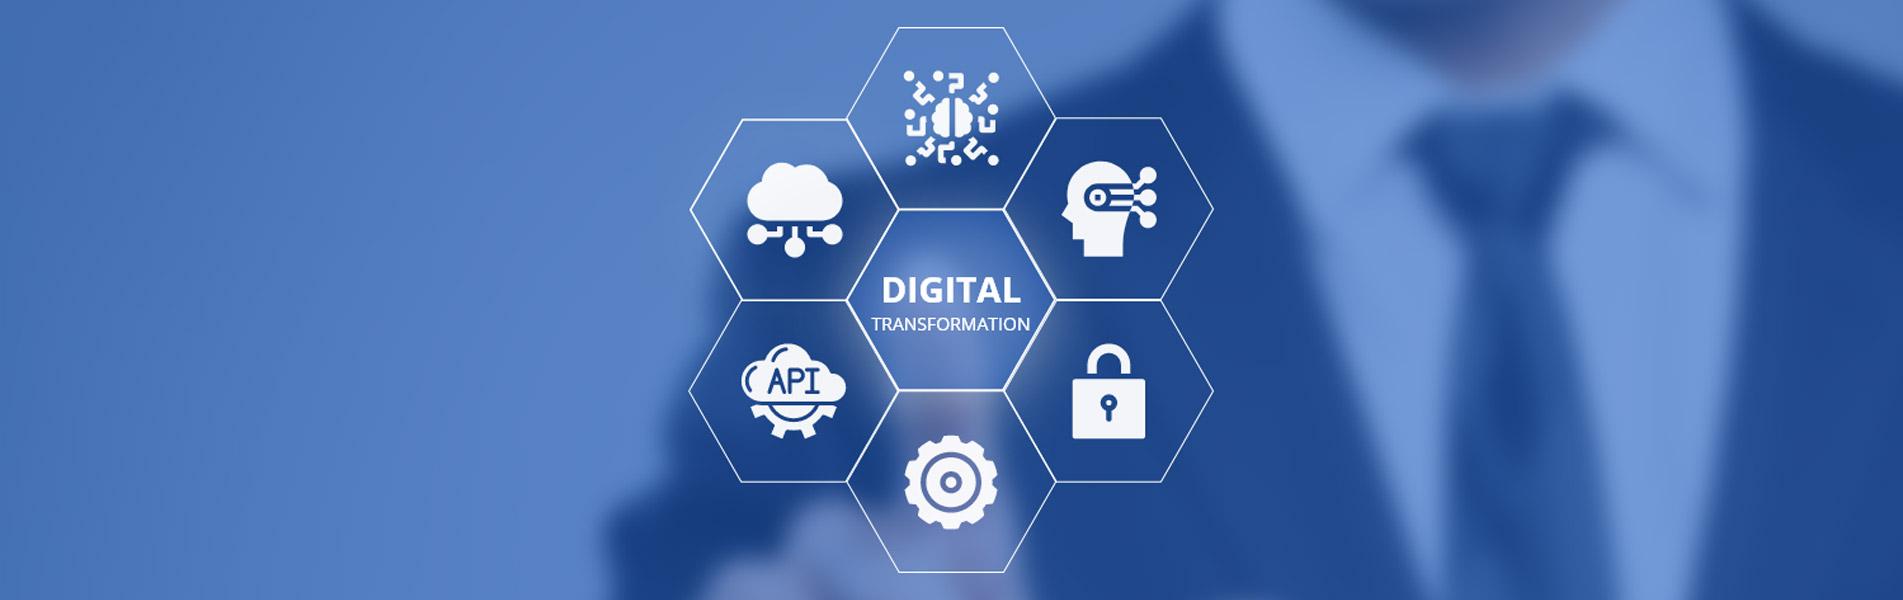 Preparing for digital transformation trends